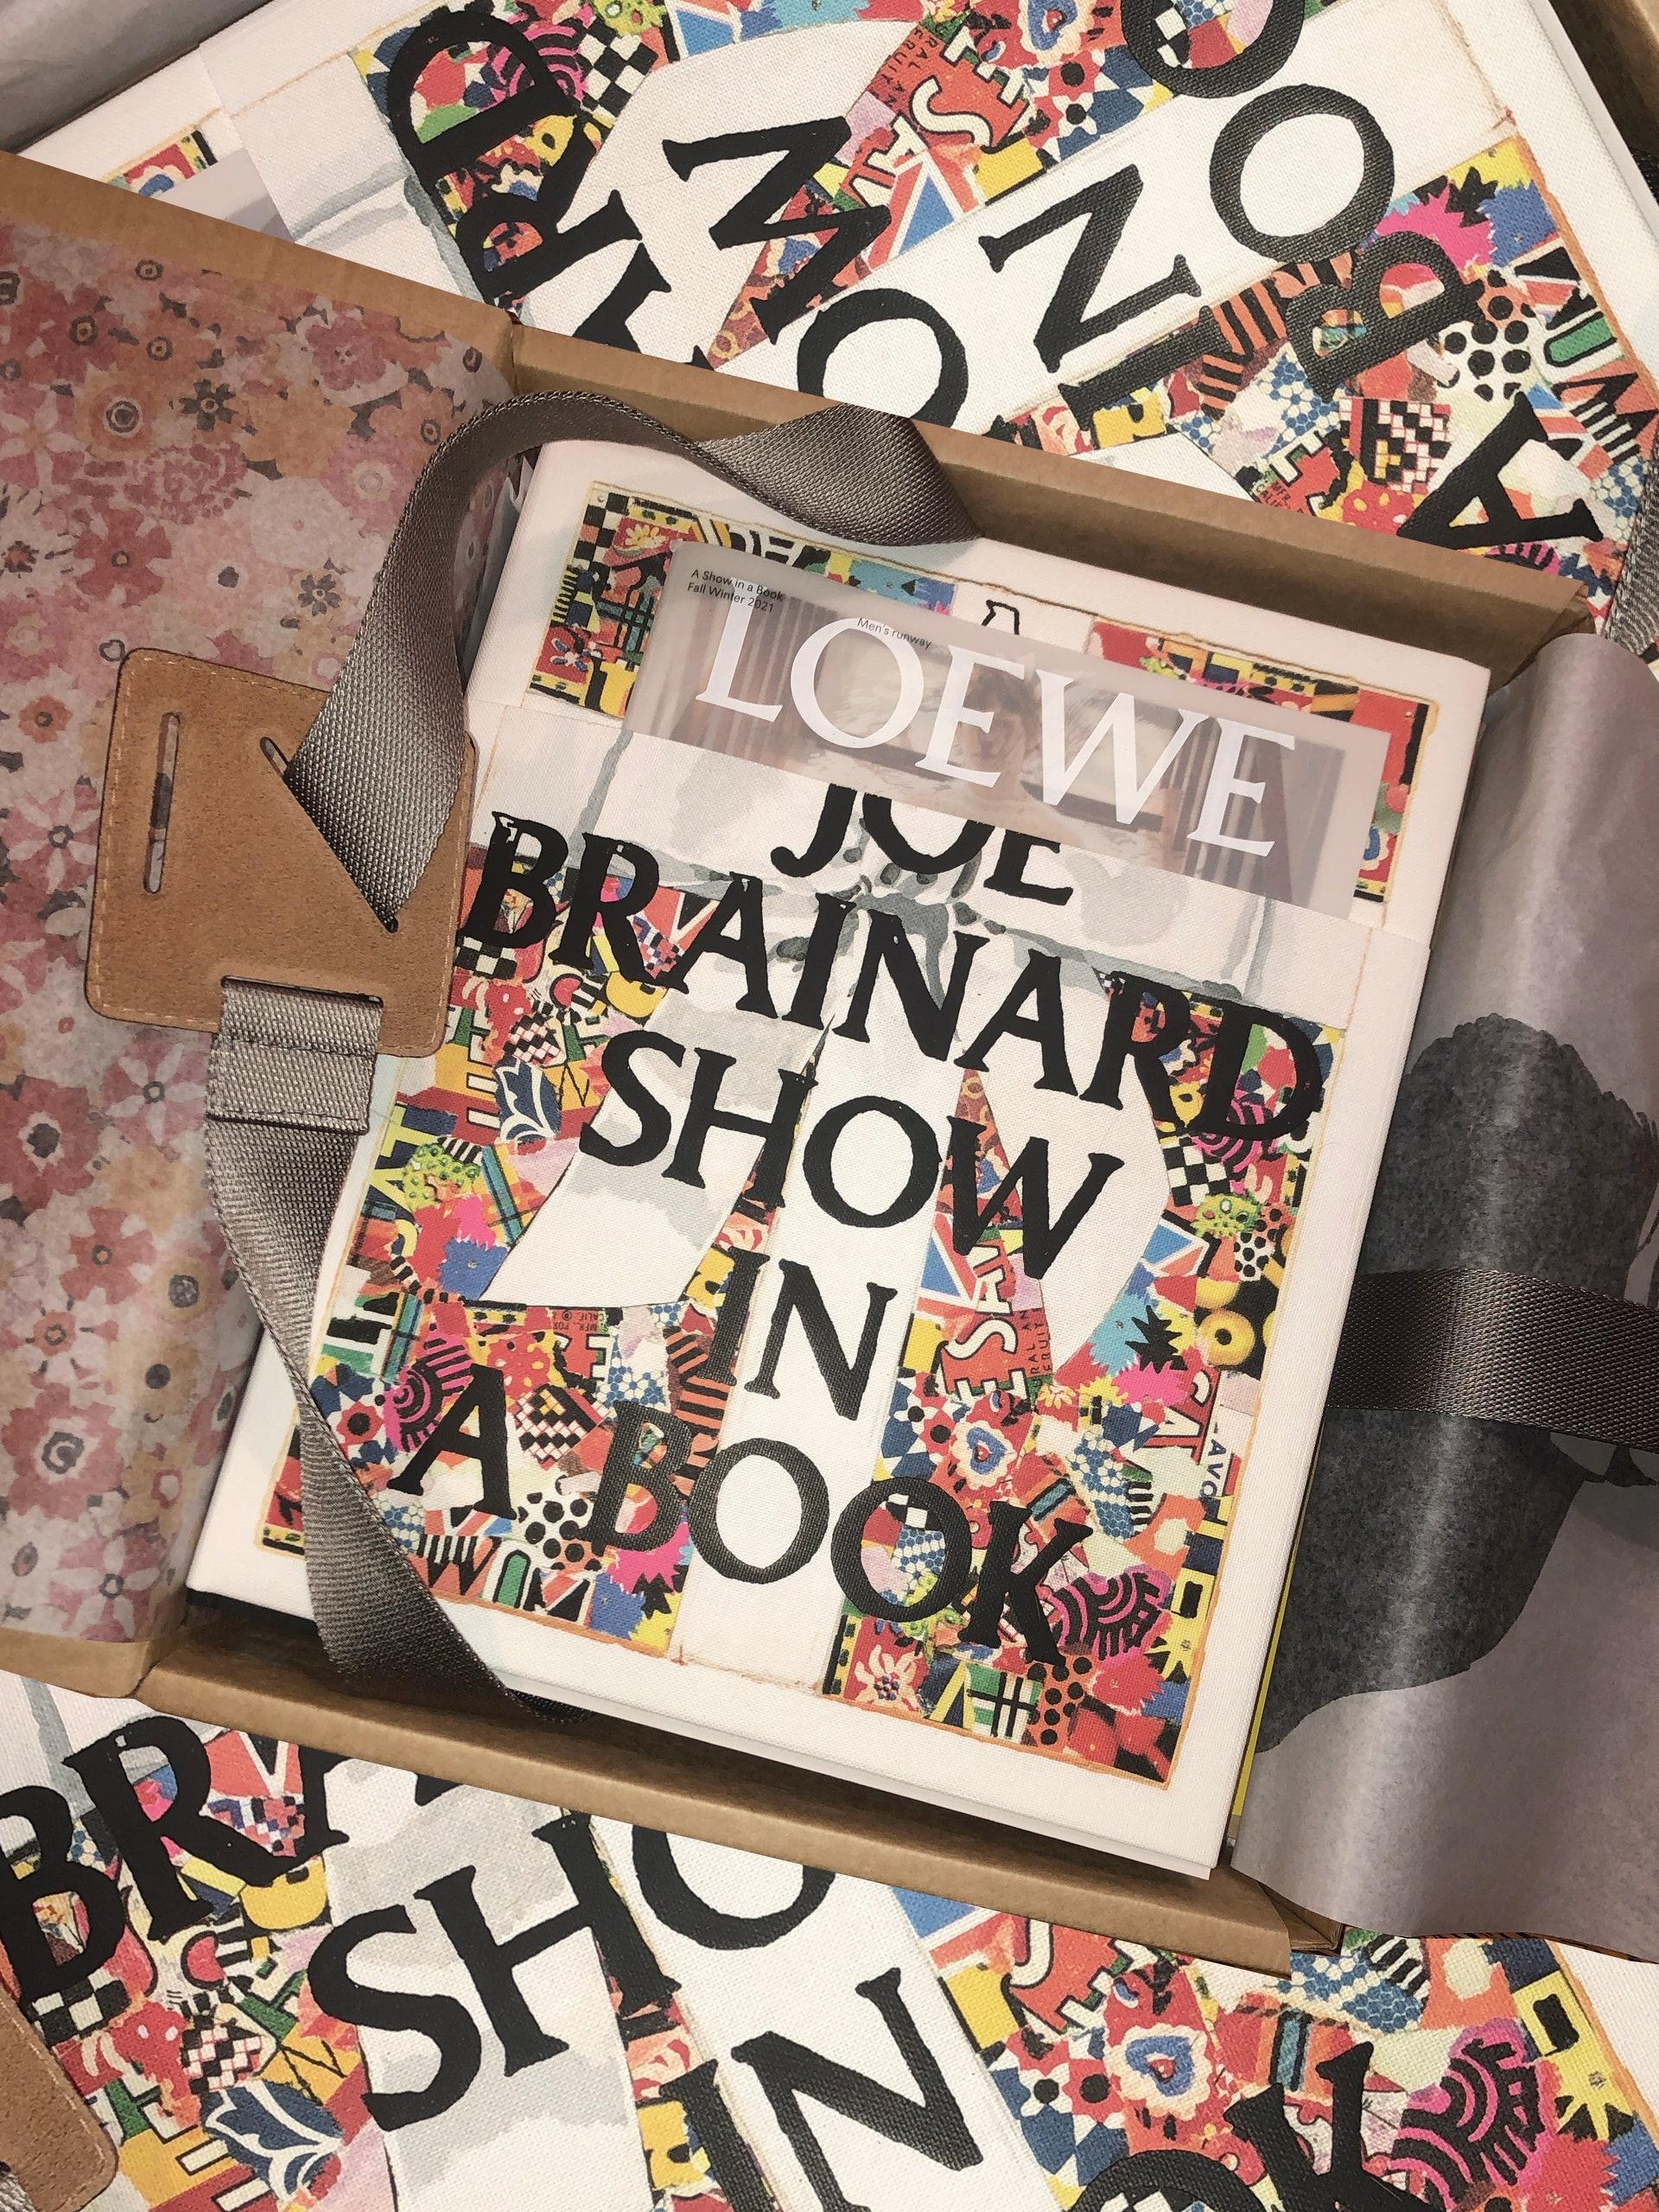 Image Loewe's BOOK